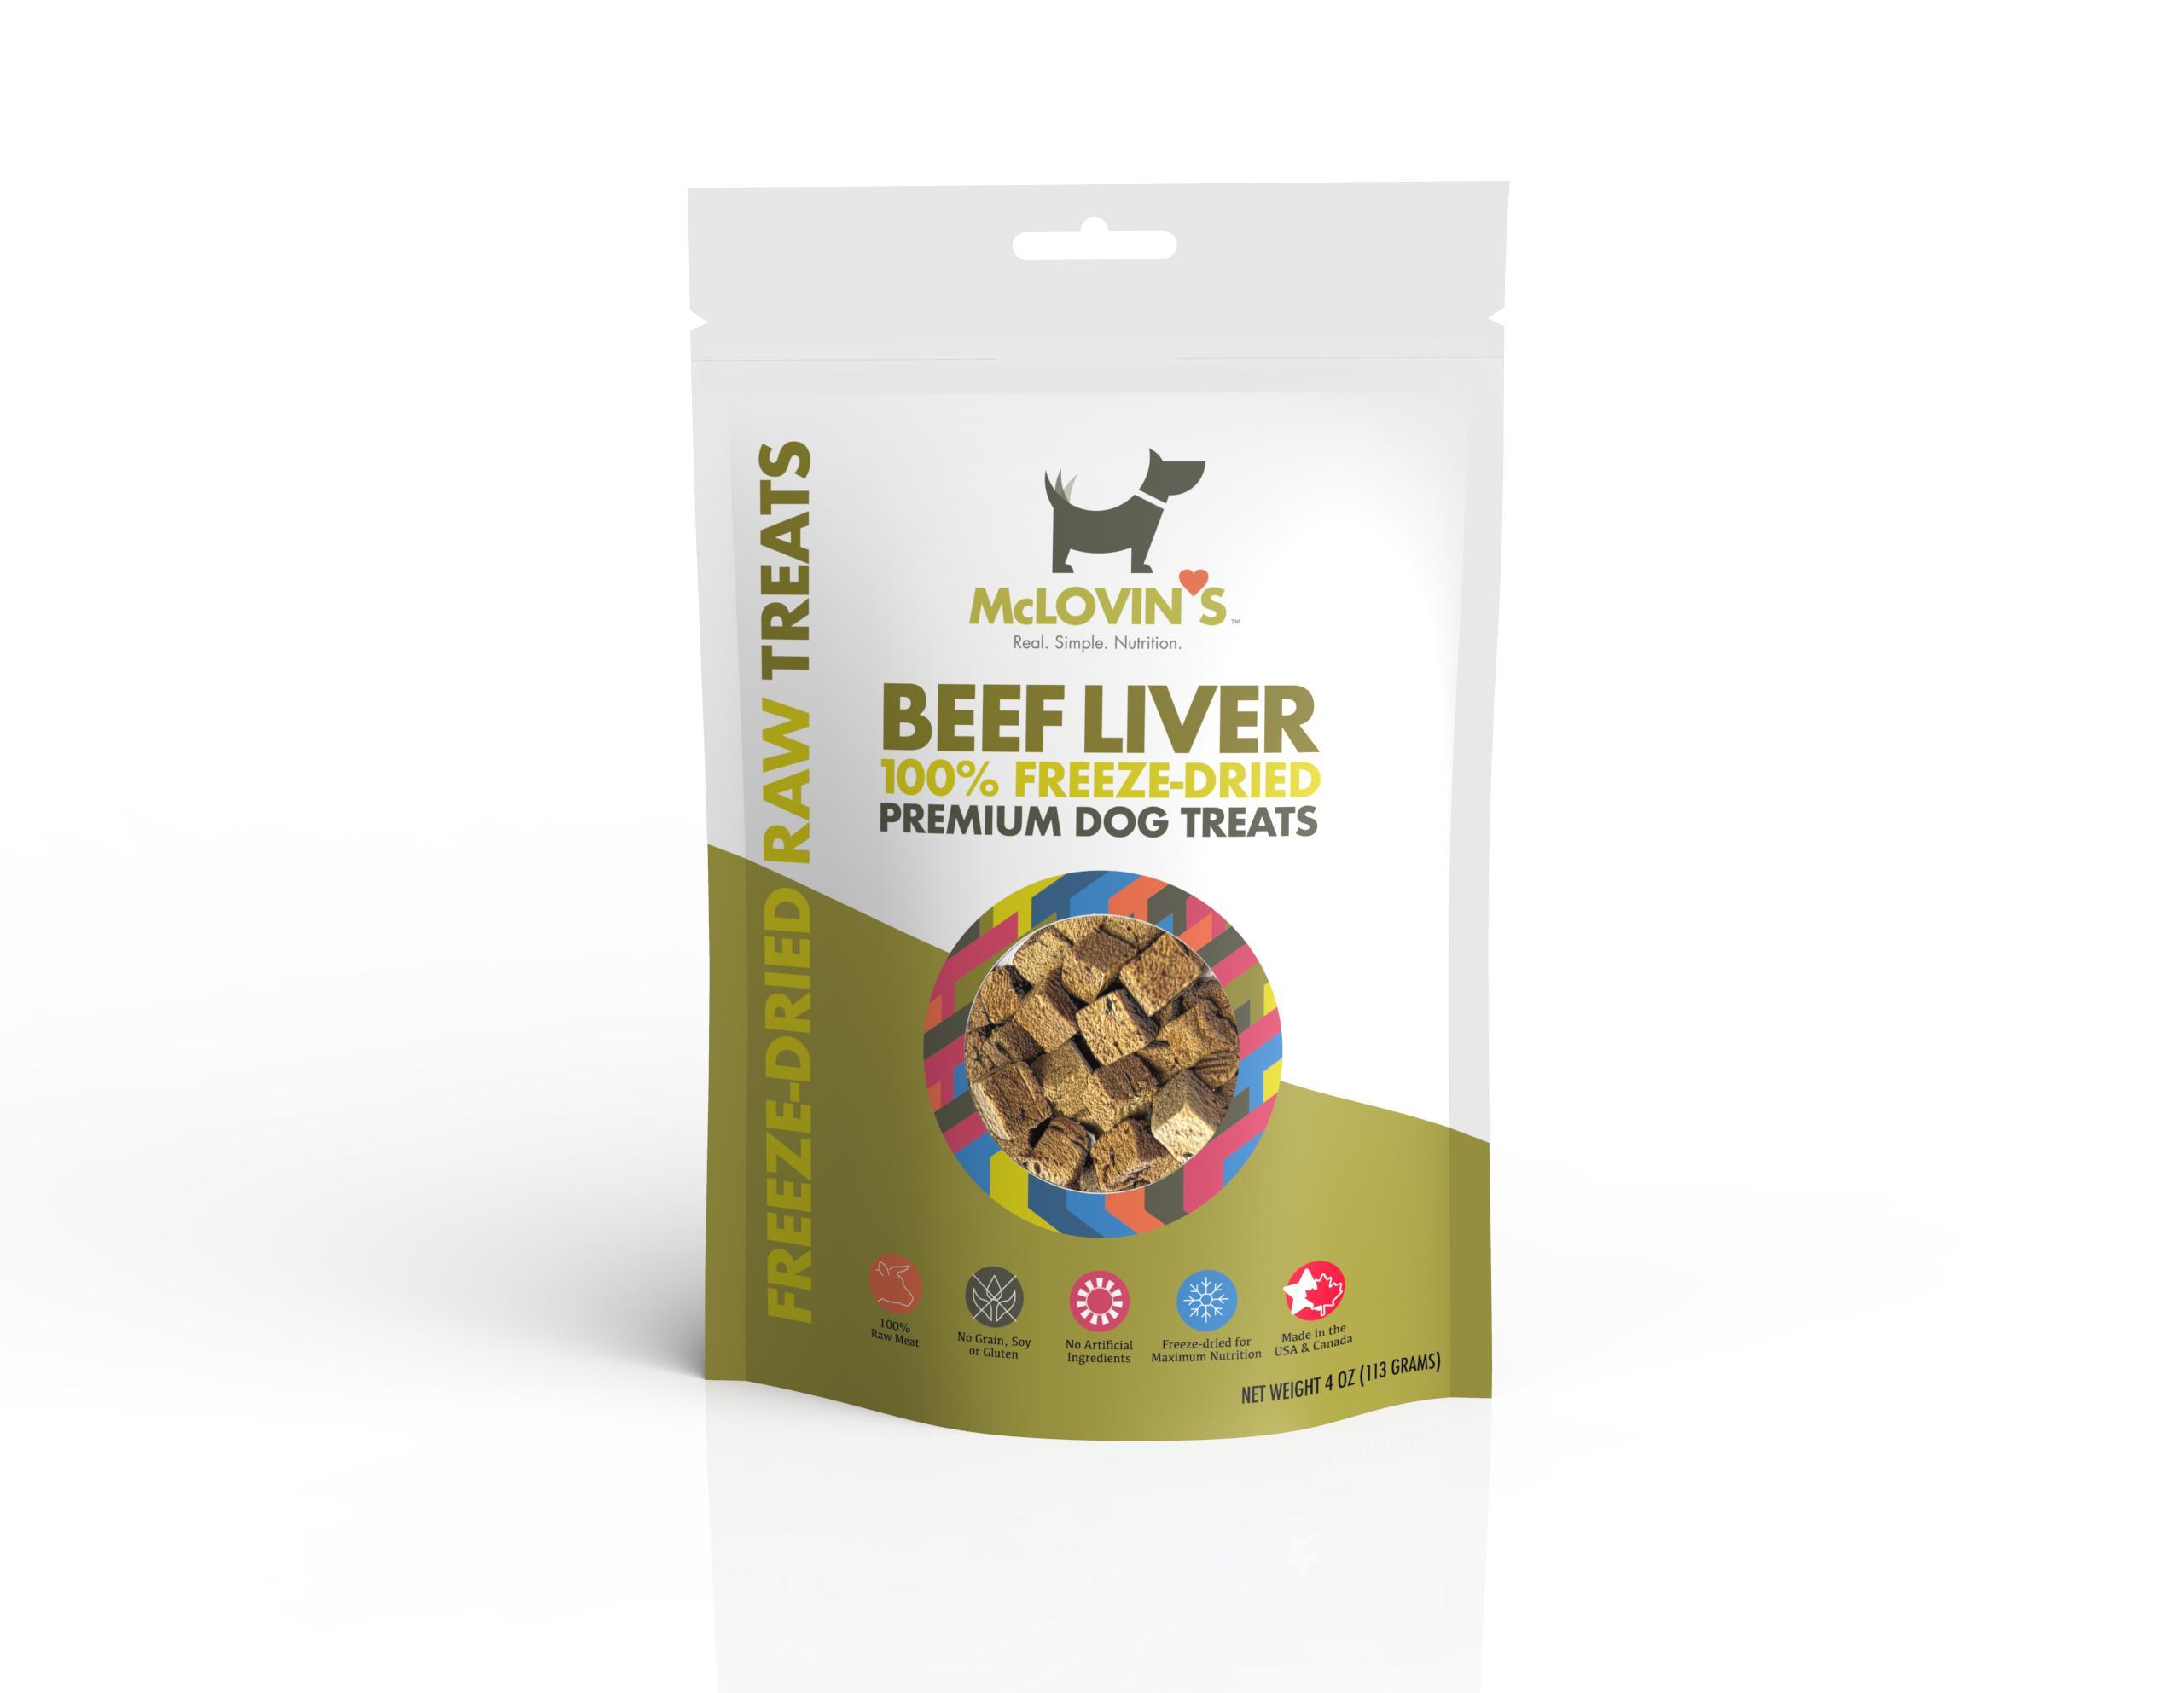 McLOVIN'S Beef Liver Freeze-Dried Dog Treats, 4-oz